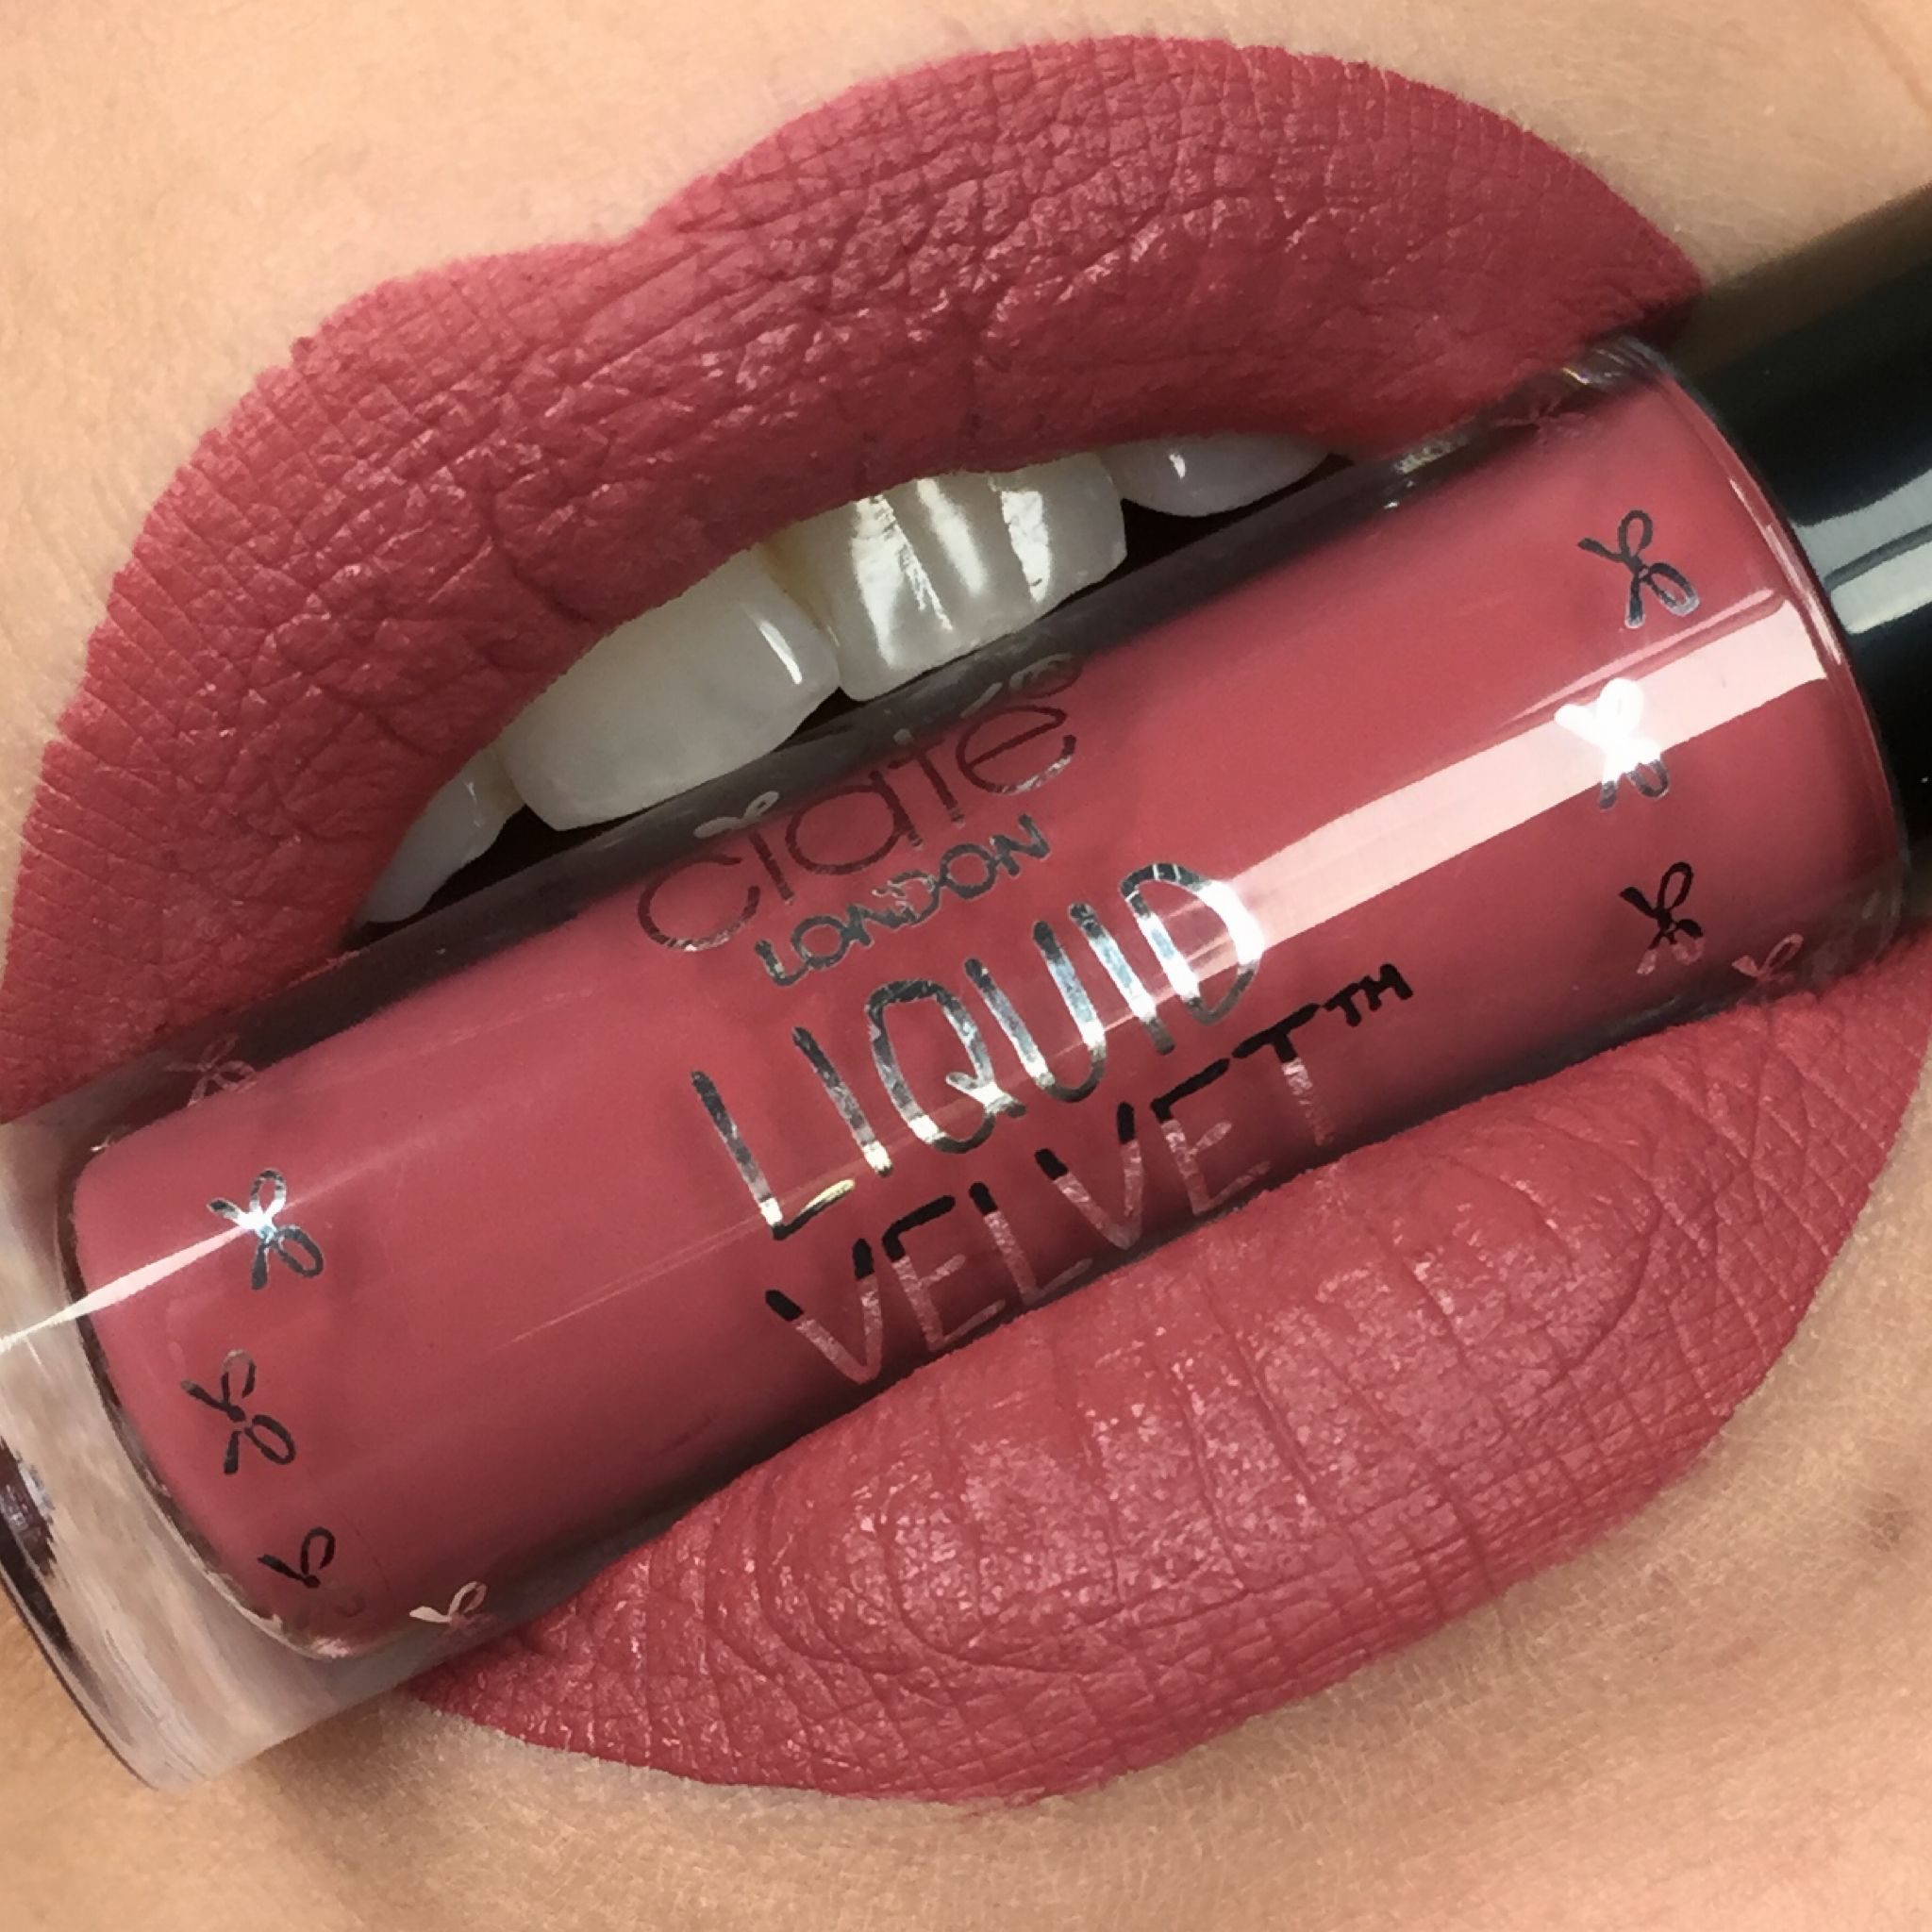 Swatch Ciate: Ciate London Liquid Velvet: Pin Up #CiateLondon #Lips